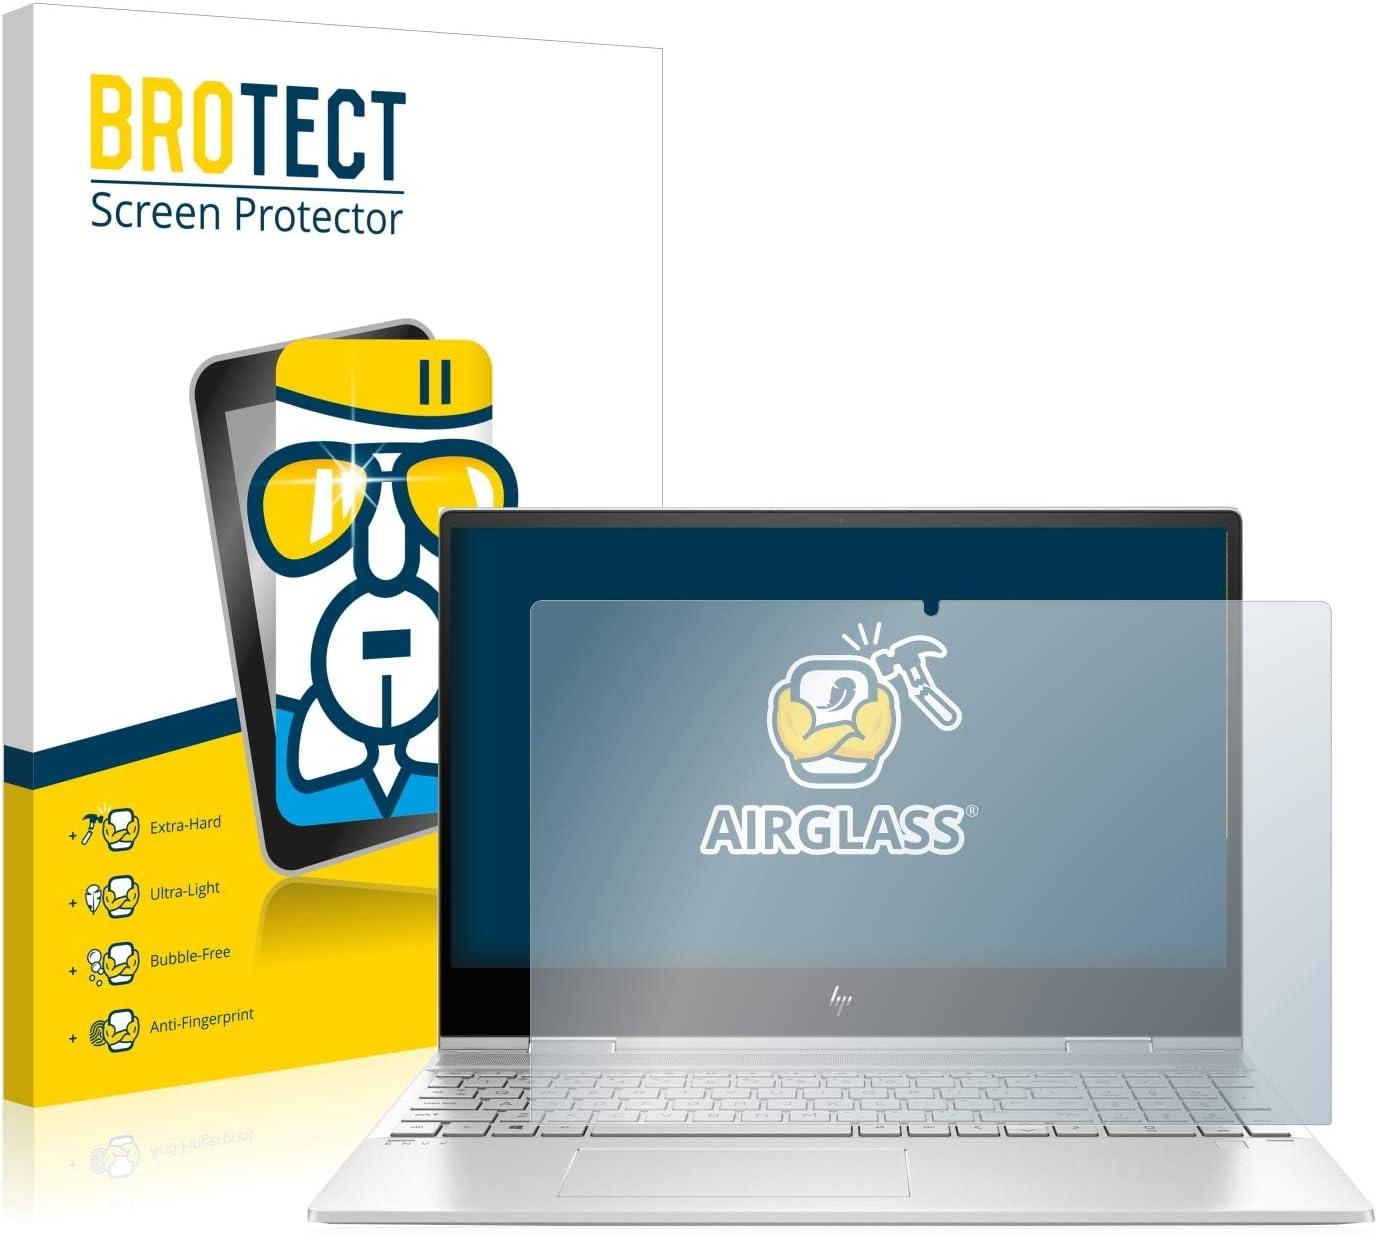 BROTECT Panzerglas Schutzfolie kompatibel mit HP Envy x360 15-ds0102ng AirGlass Anti-Fingerprint extrem Kratzfest Ultra-transparent